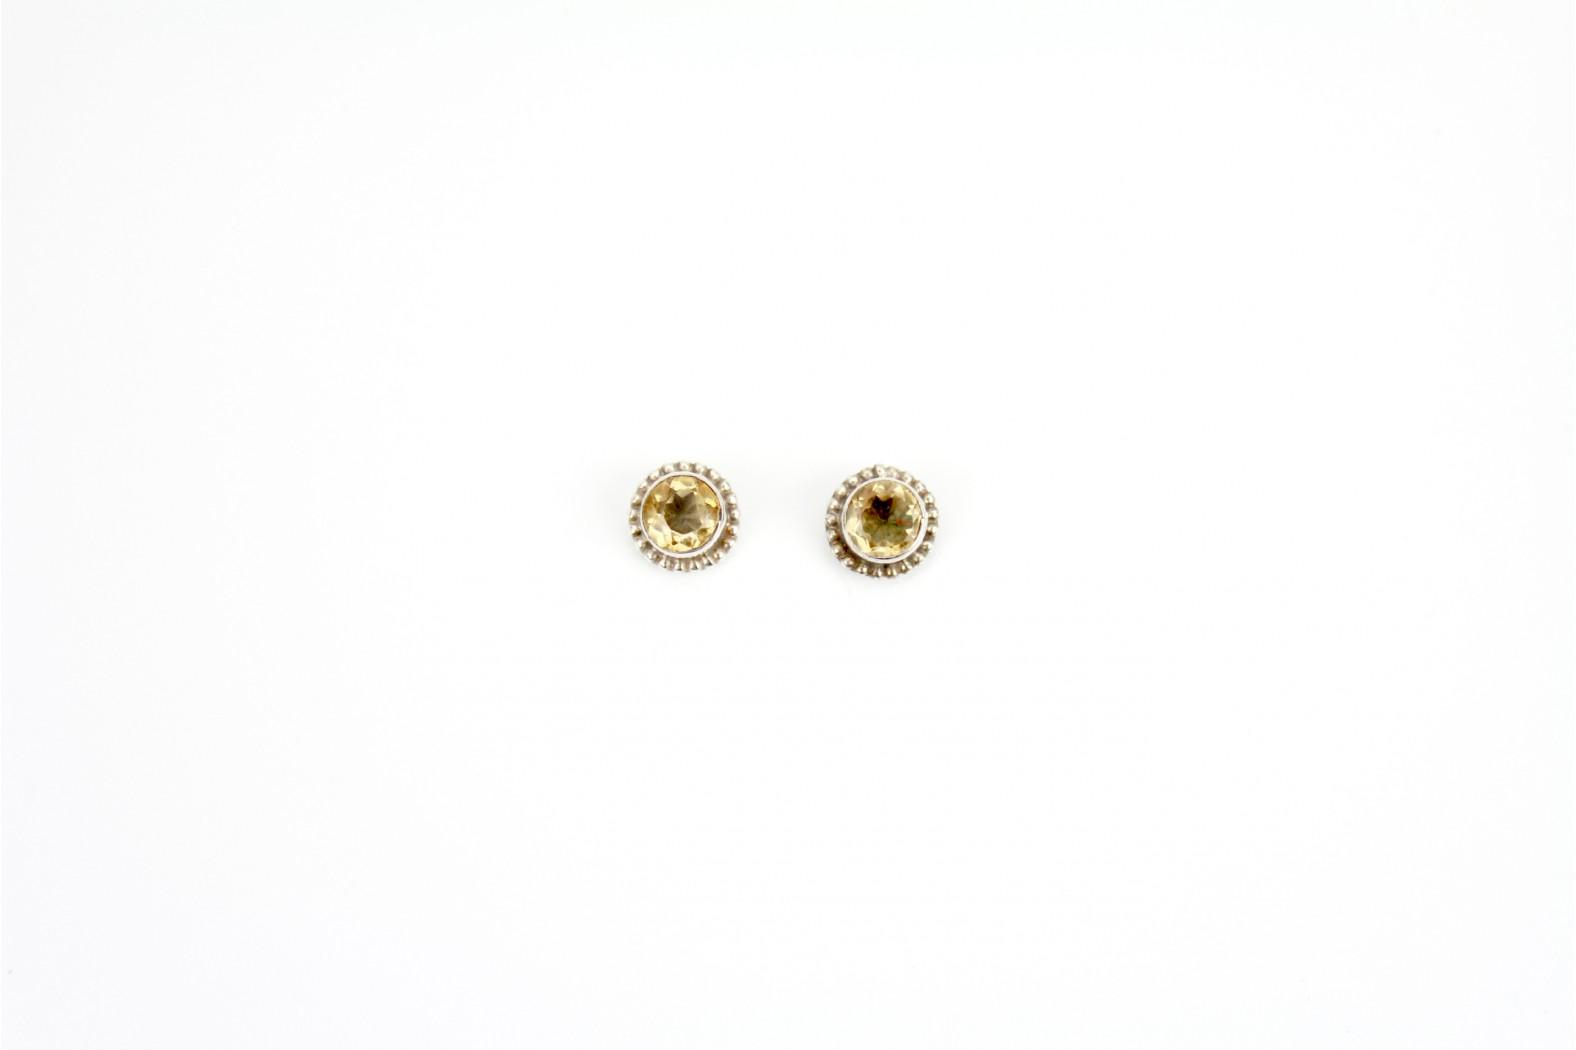 Circular Light Smokey Quartz stud earrings antique setting